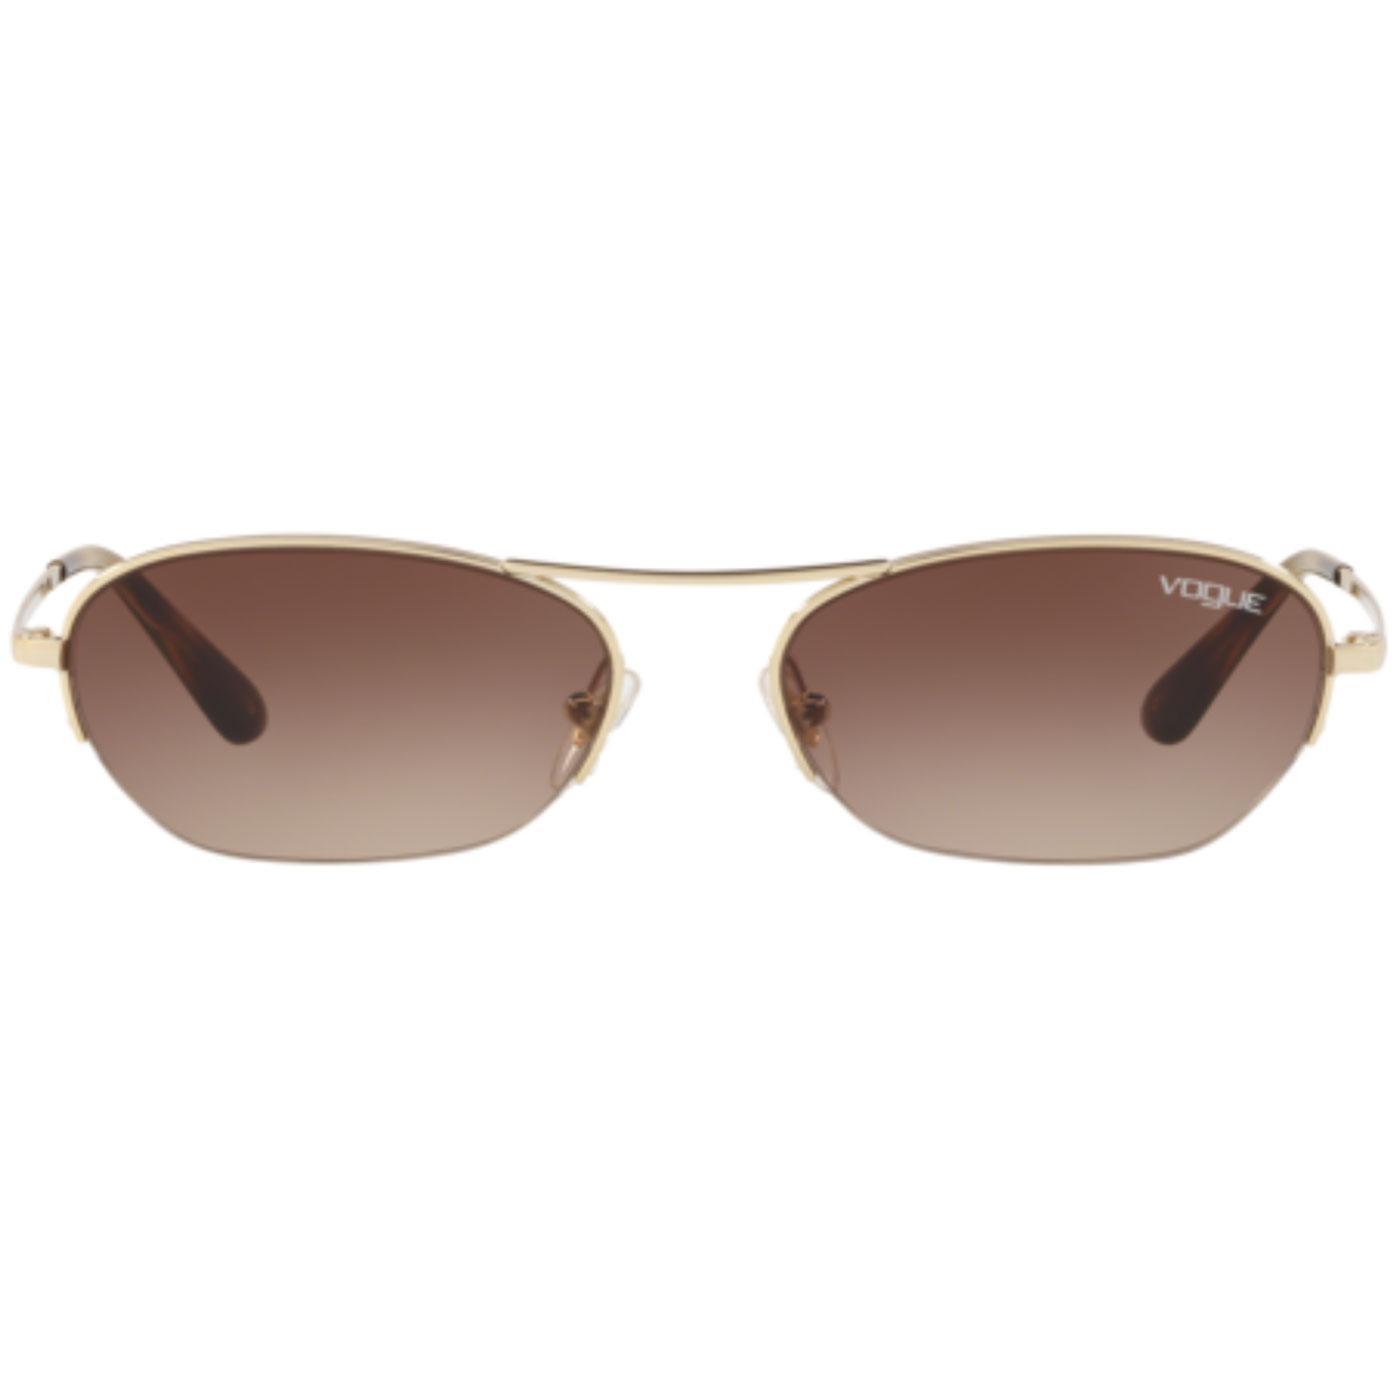 VOGUE x GIGI HADID Retro Oval Pale Gold Sunglasses